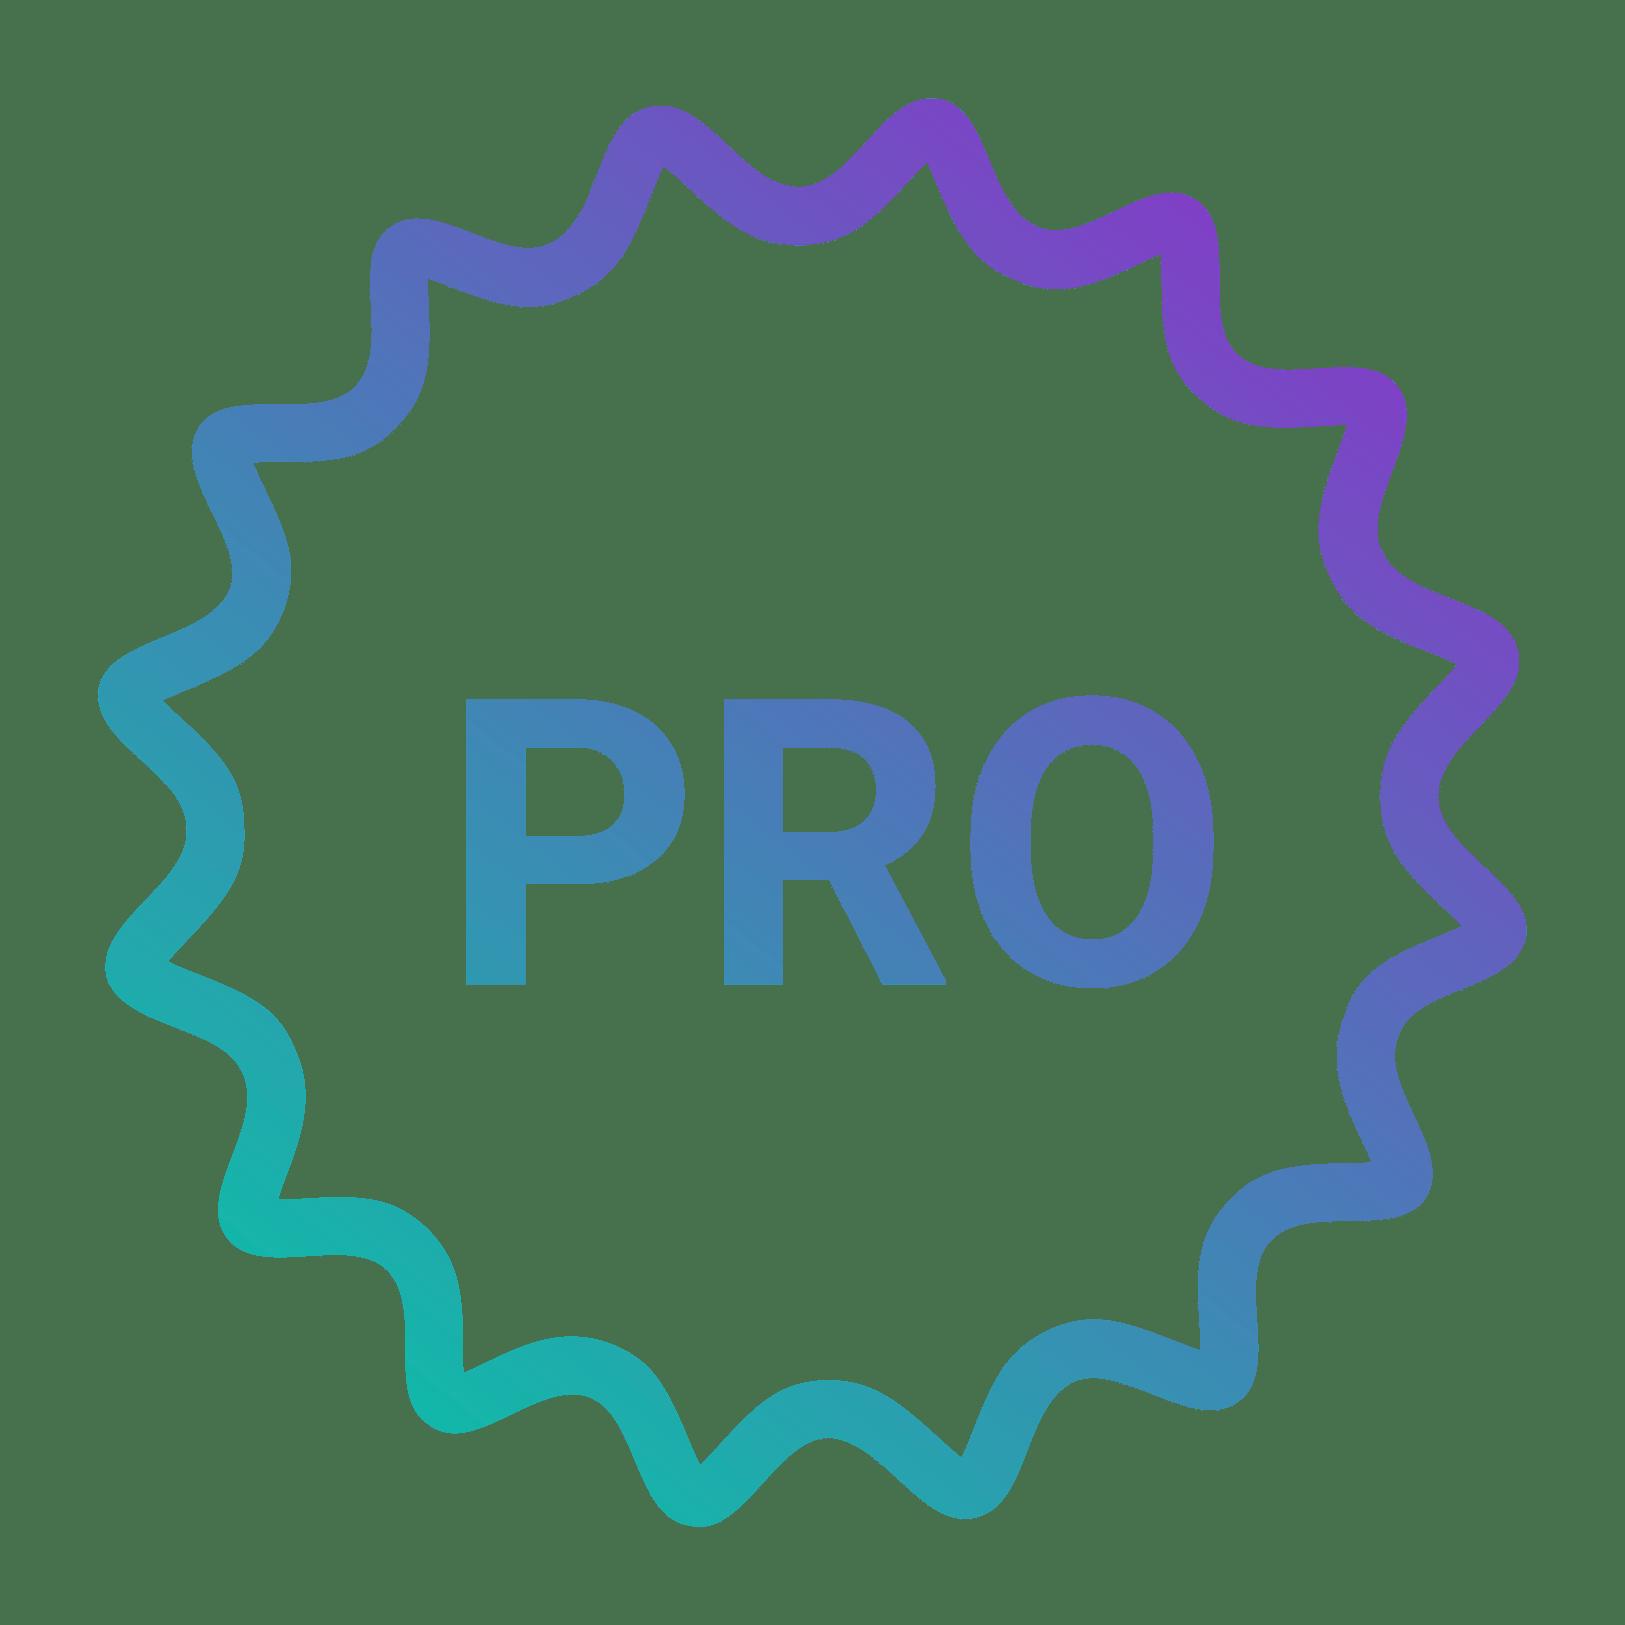 Vampr Pro